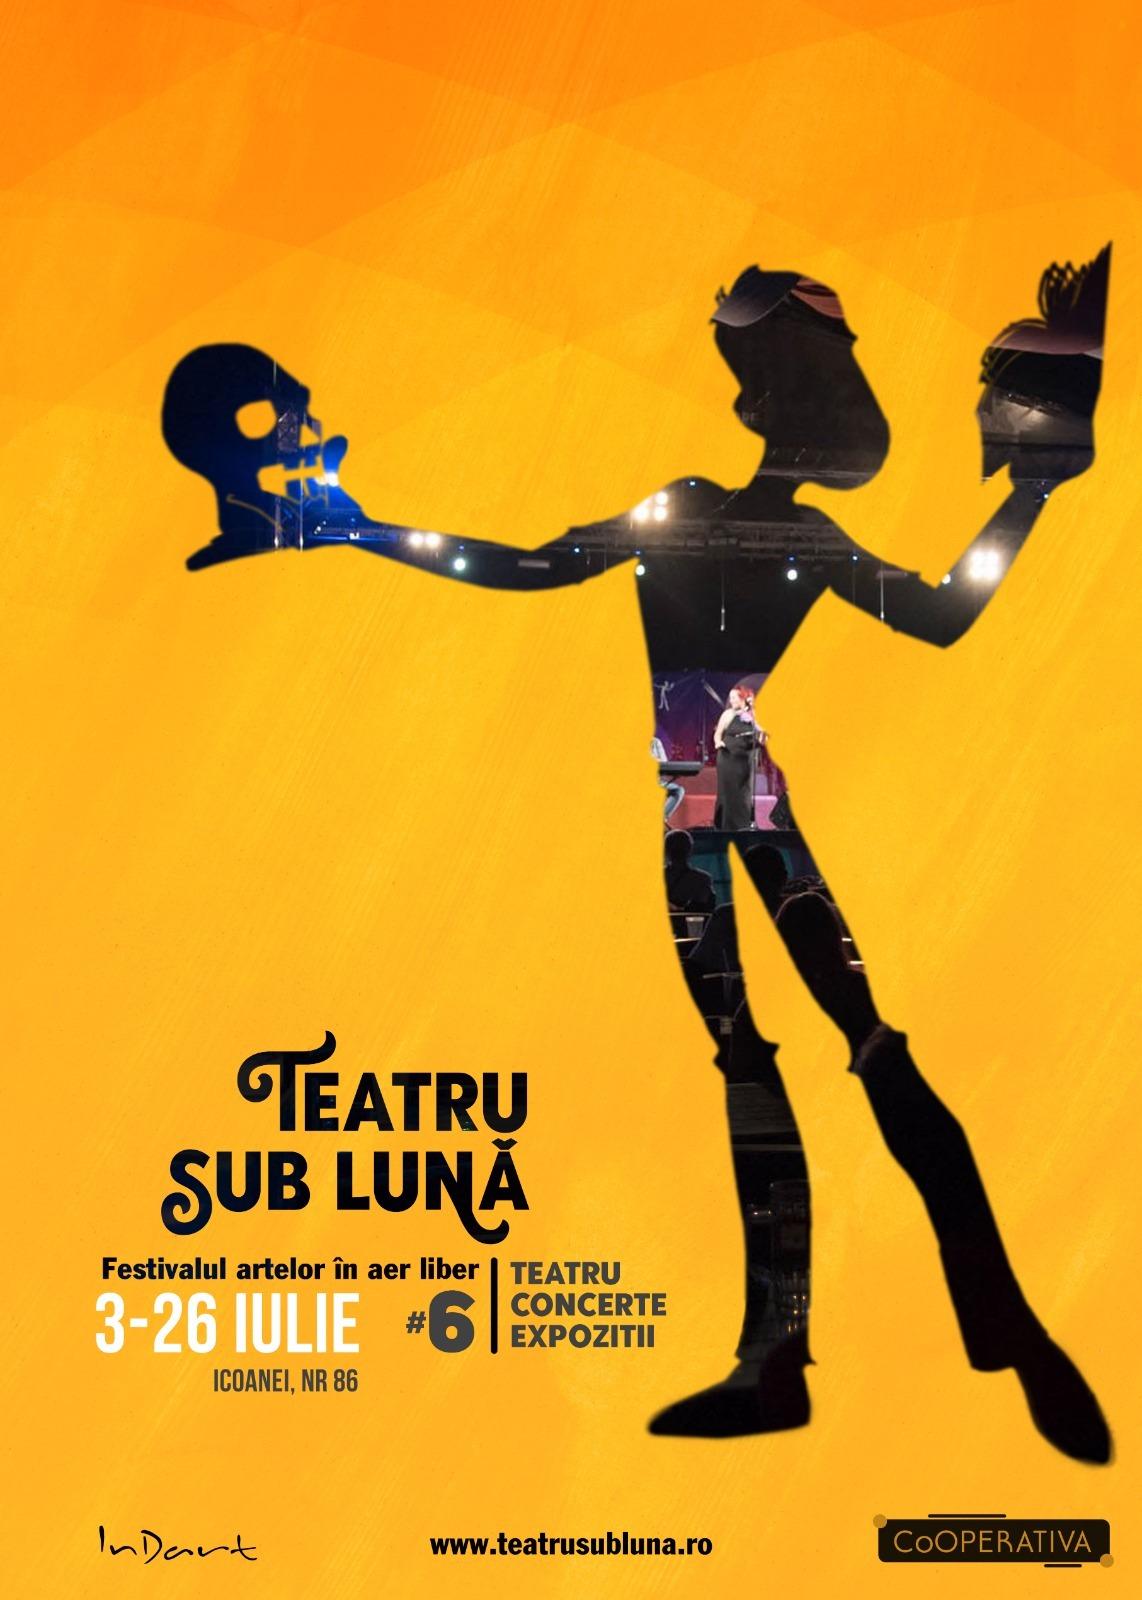 weekend 3-5 iulie festivalul teatrul sub luna